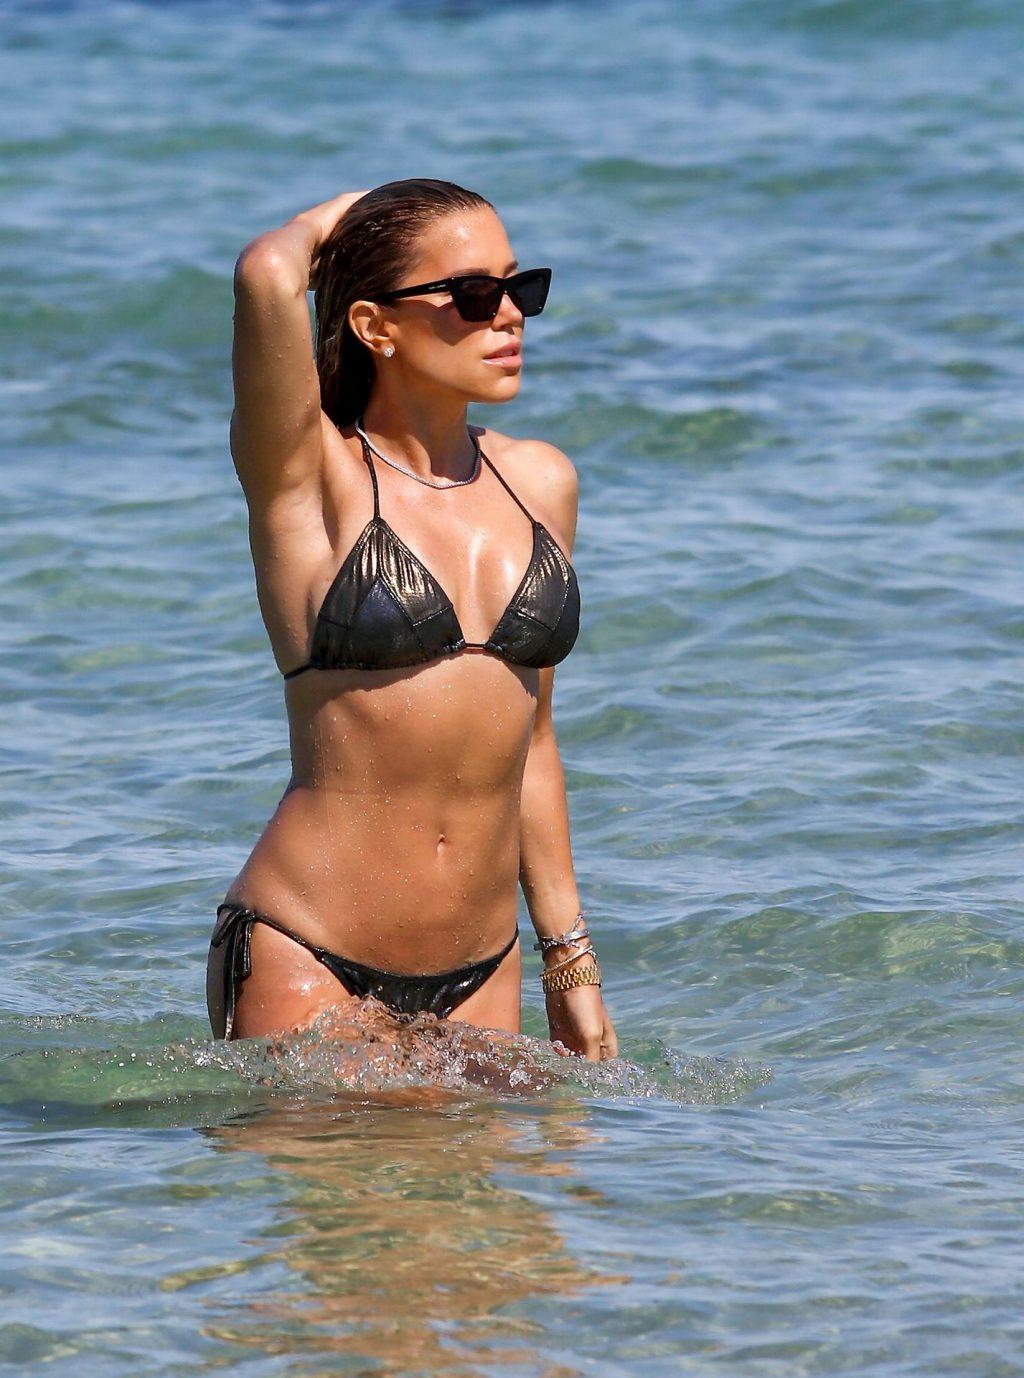 Sylvie Meis Displays Her Sexy Body in a Bikini on the Beach (64 Photos)